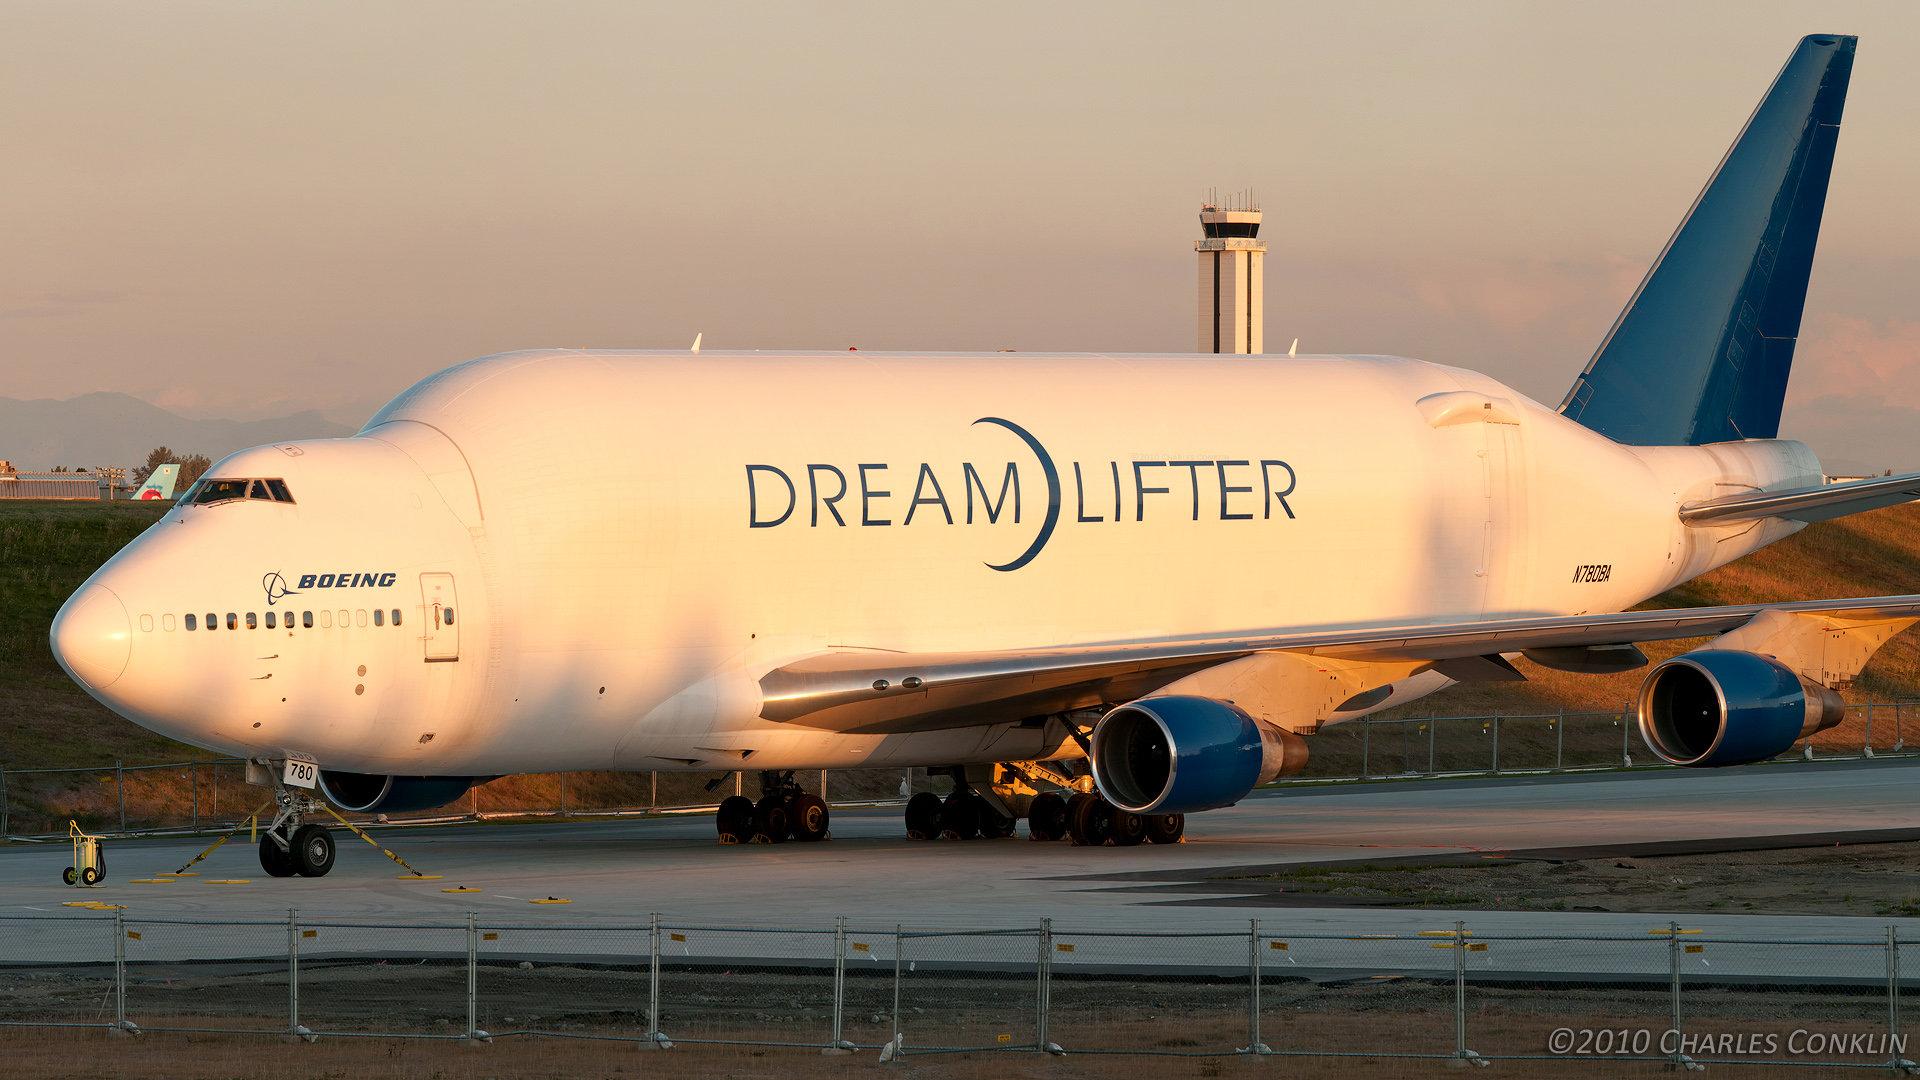 Boeing 747 wallpapers 1920x1080 Full HD (1080p) desktop